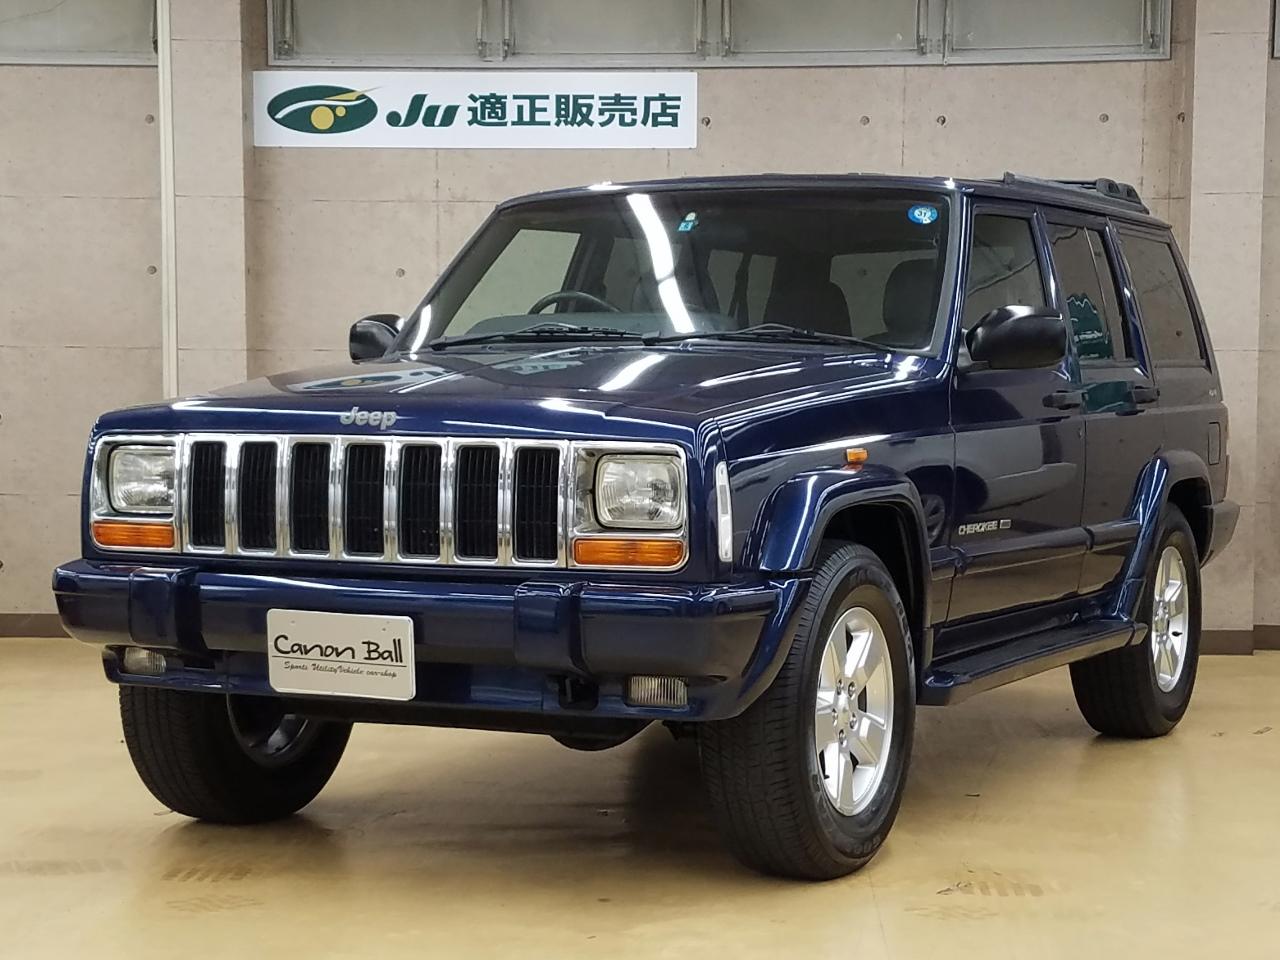 LTD 黒本革シート&ウッドインテリア XJ型Jeep最終モデル のイメージ画像です